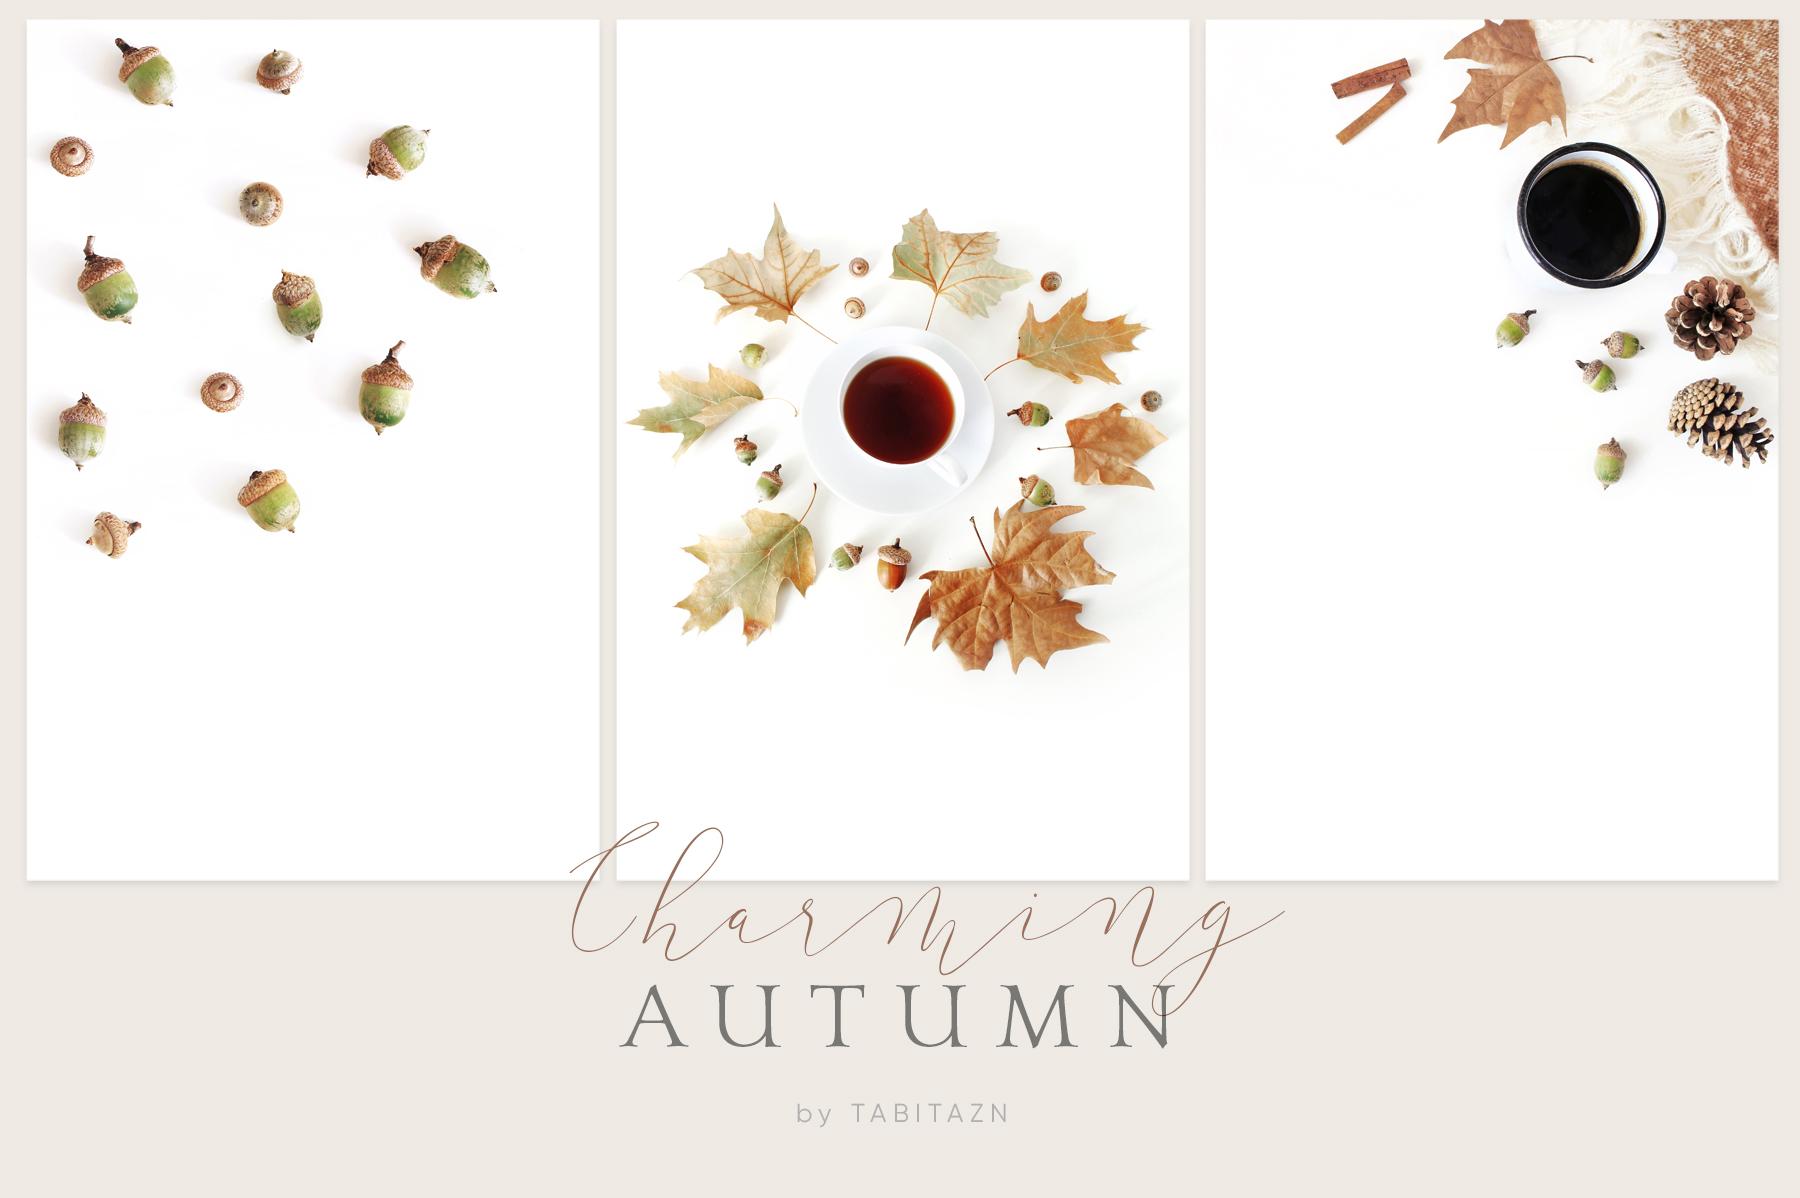 20 Charming autumn mockups & stock photo bundle example image 4